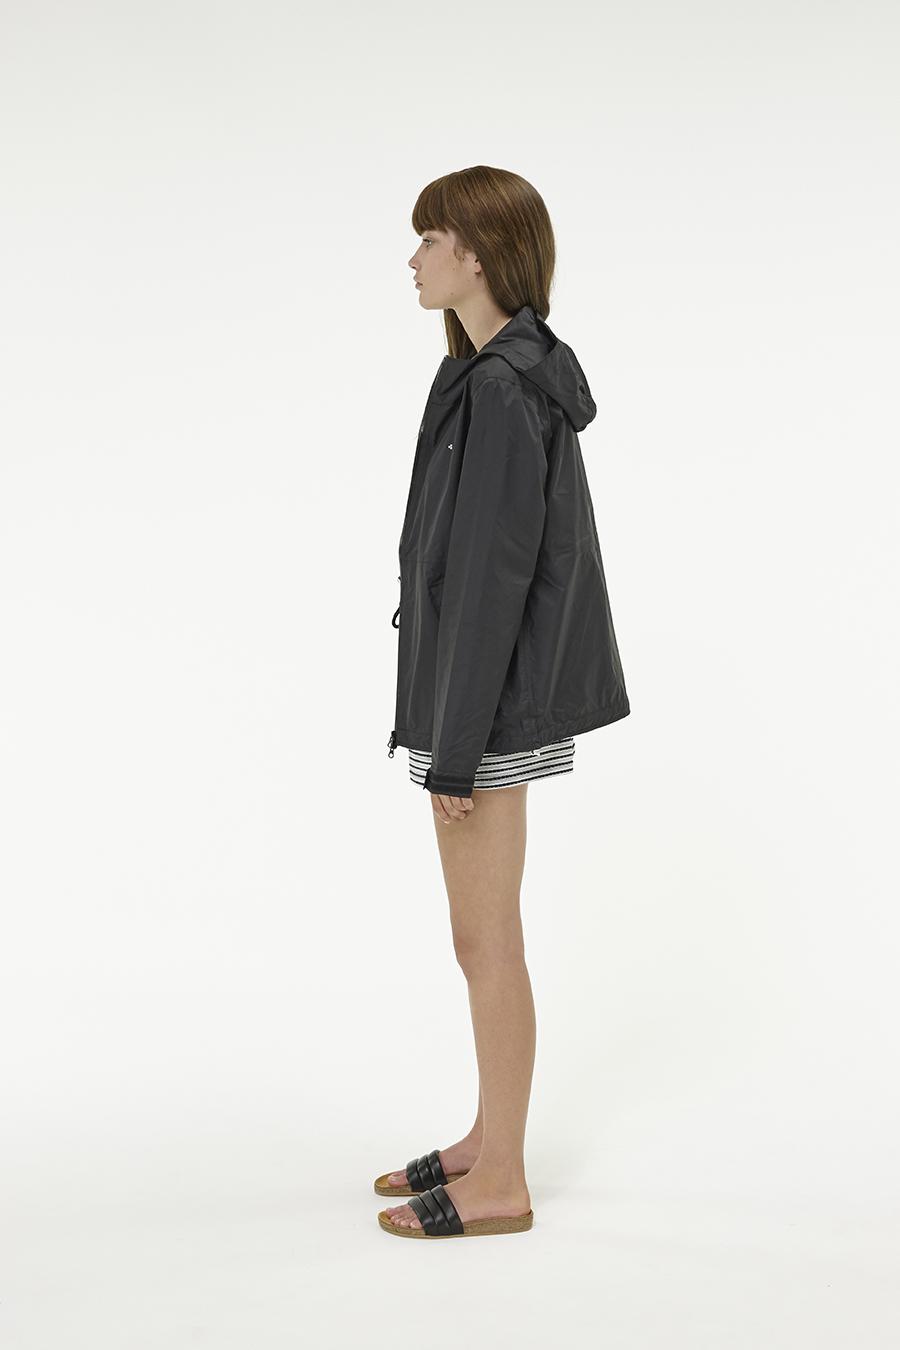 Huffer_Q3-16_W-Alpine-Jacket_Black-02